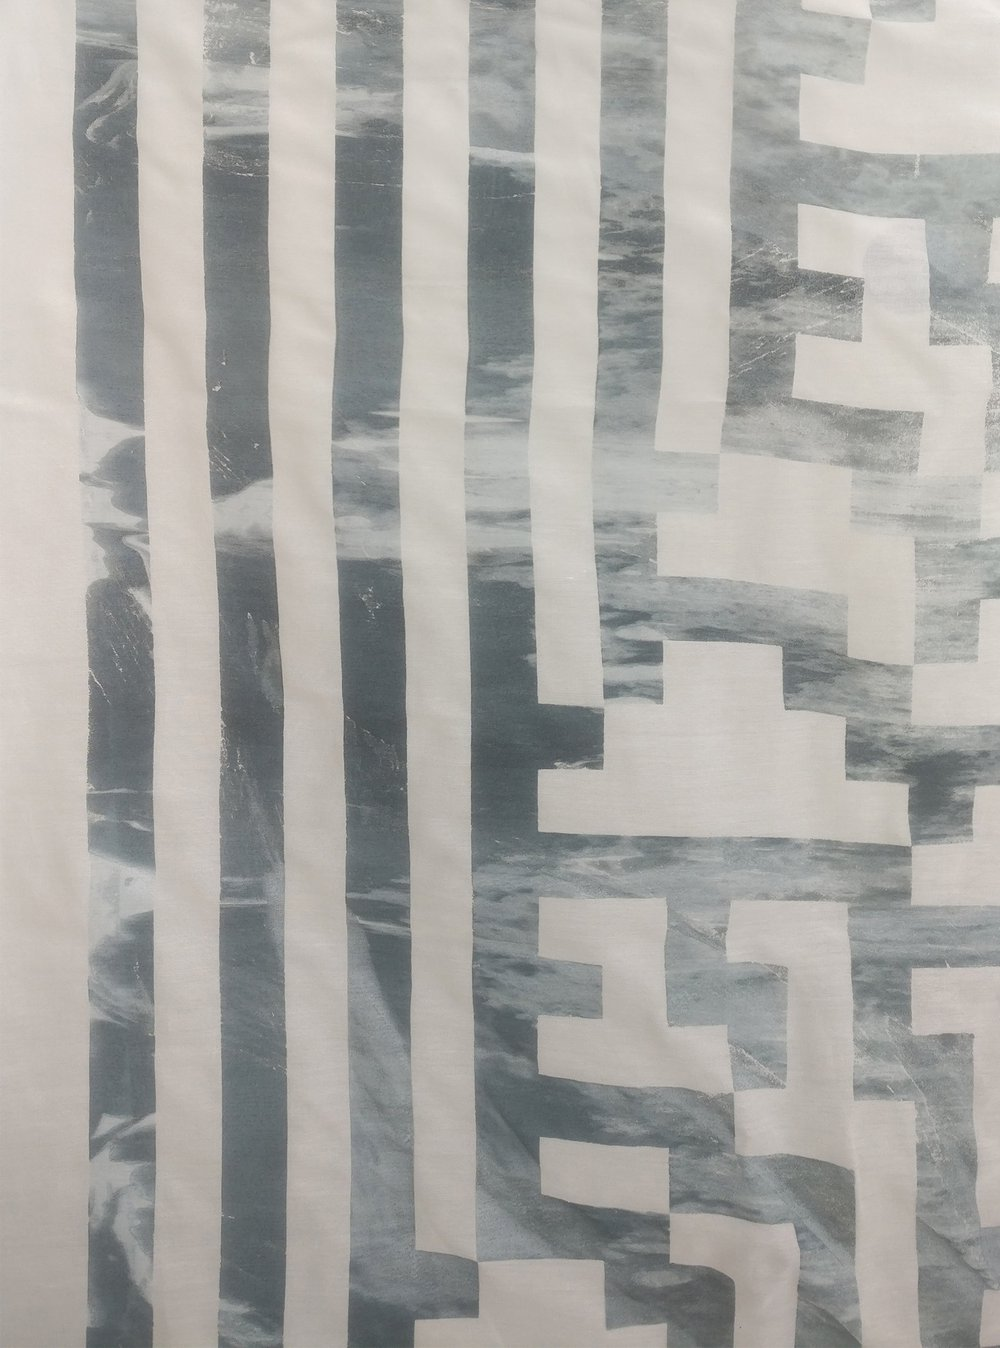 Binary print by hand